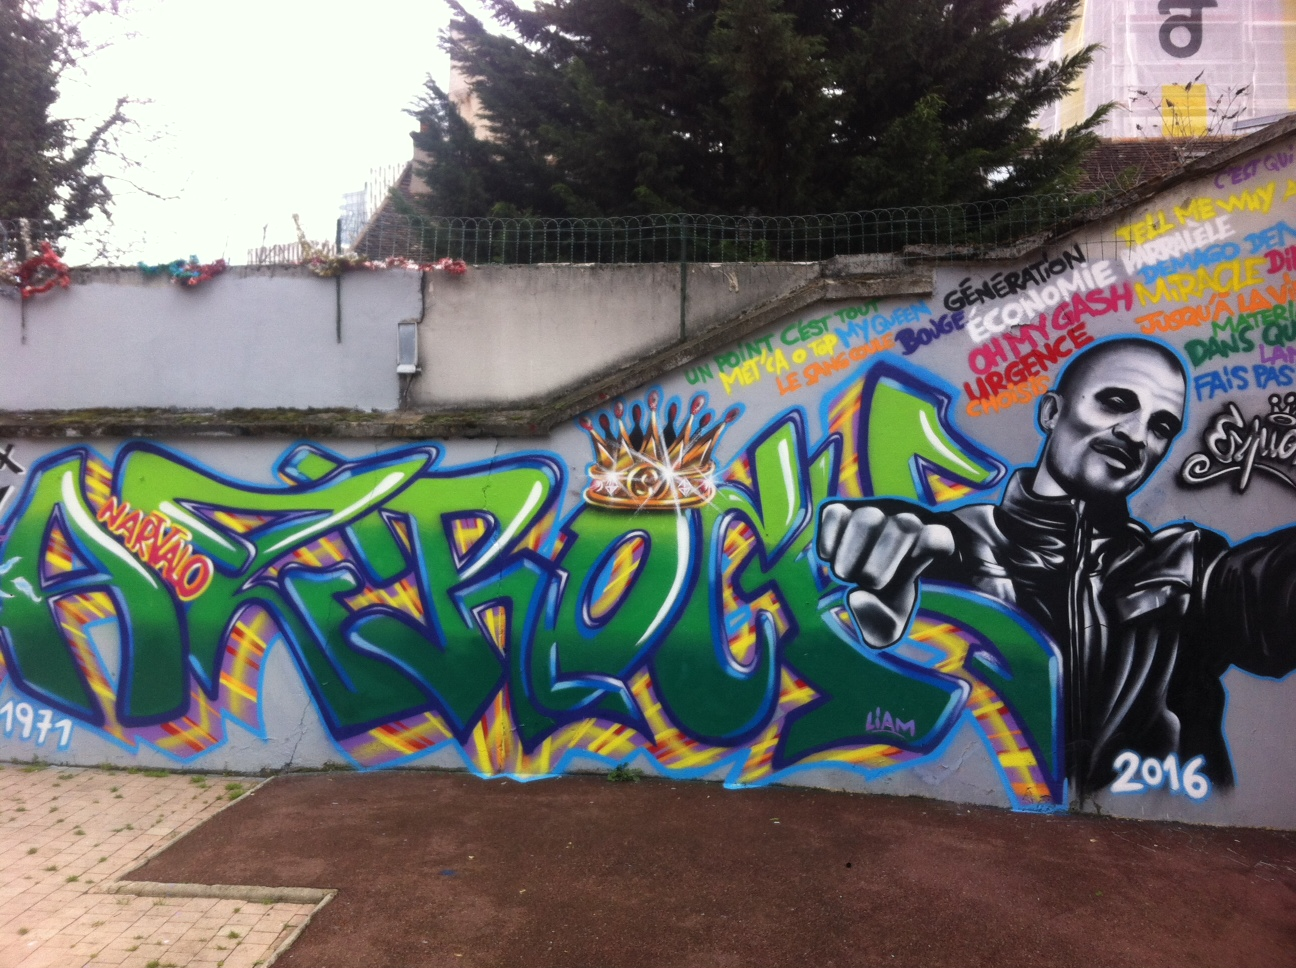 Azrock Hommage by ESPION